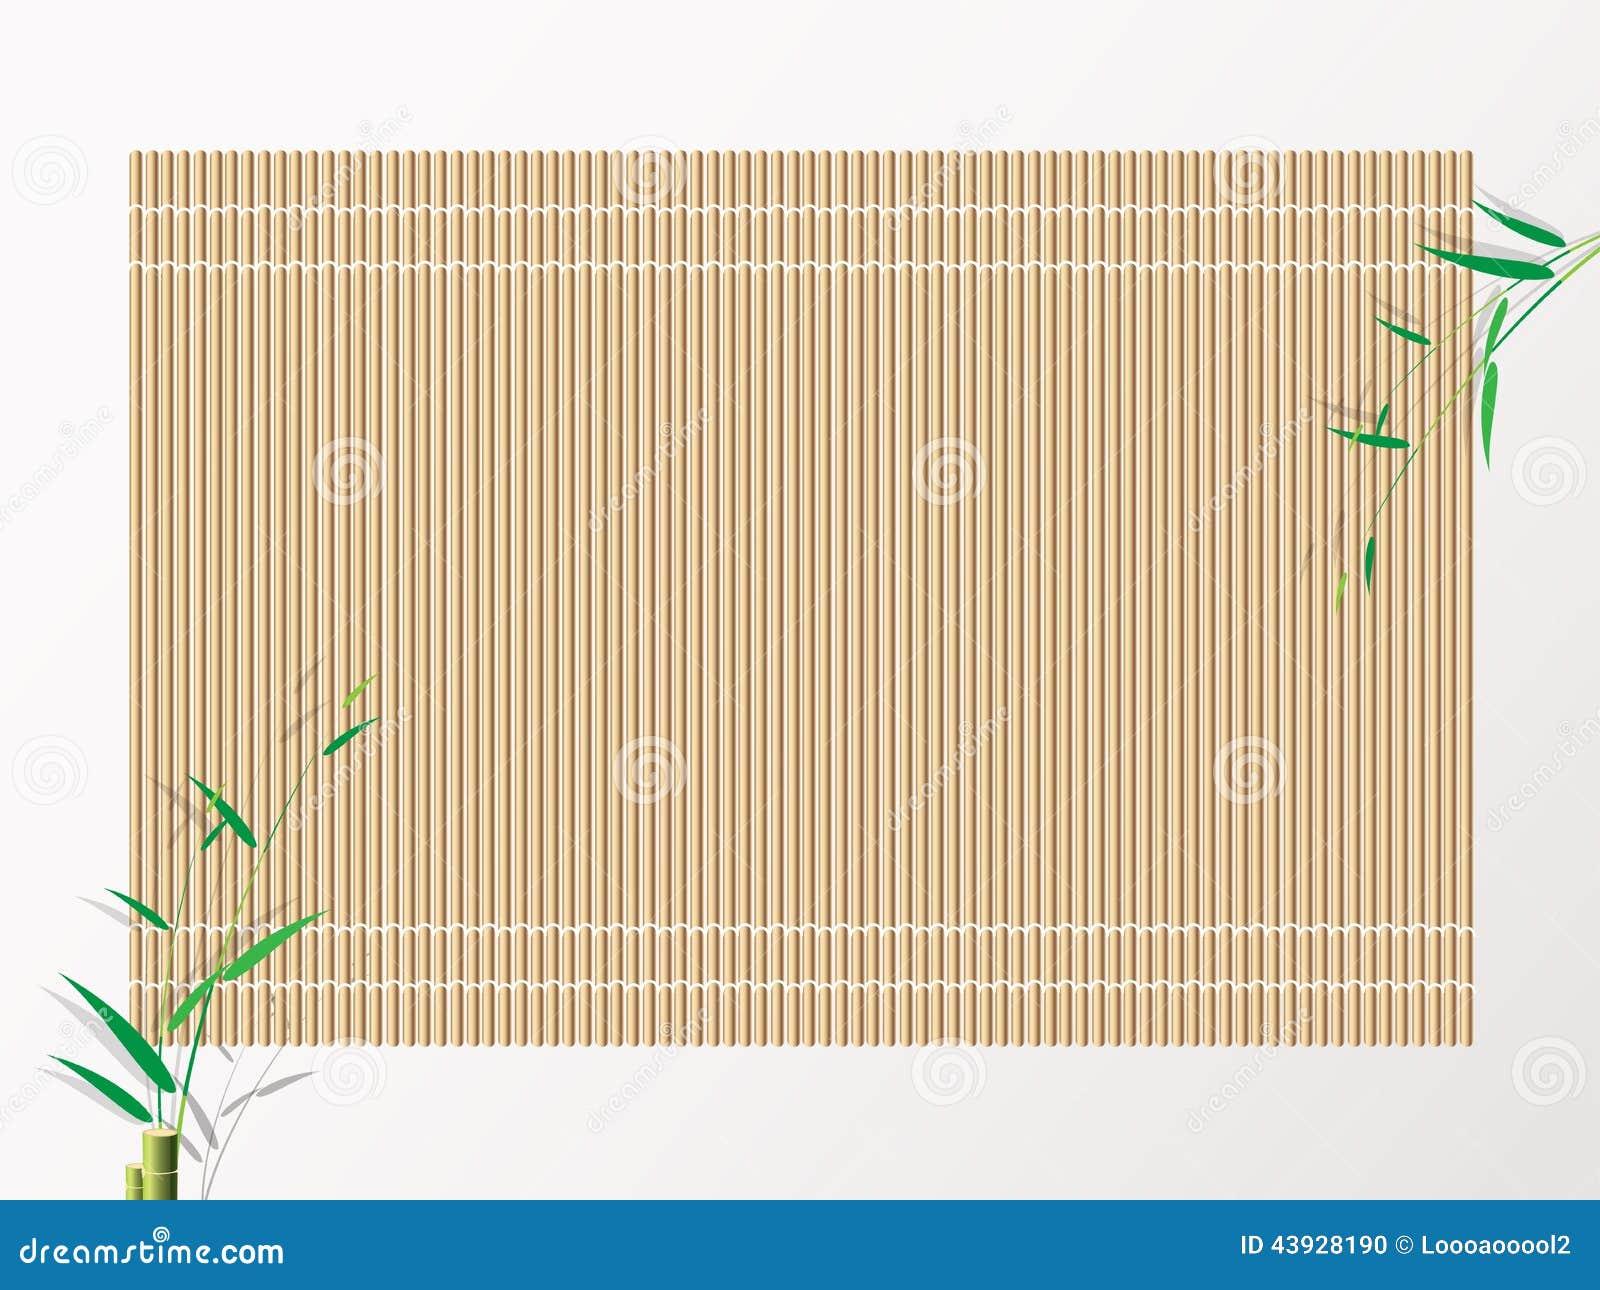 Bamboo Sushi Rolling Mat Background Vector Illustration